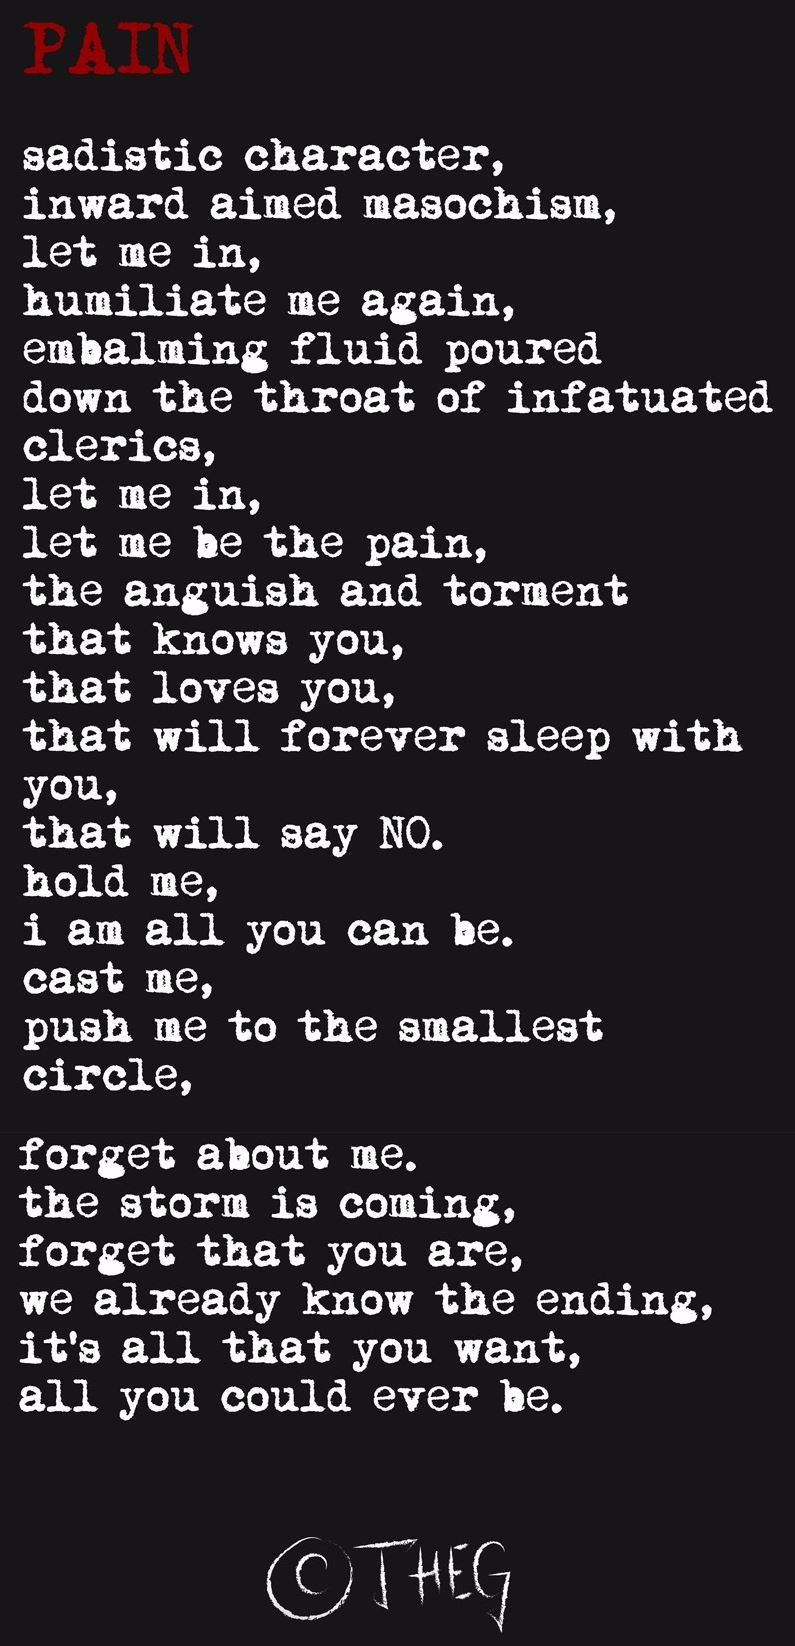 poems  - poetry, story, stories - datheg | ello